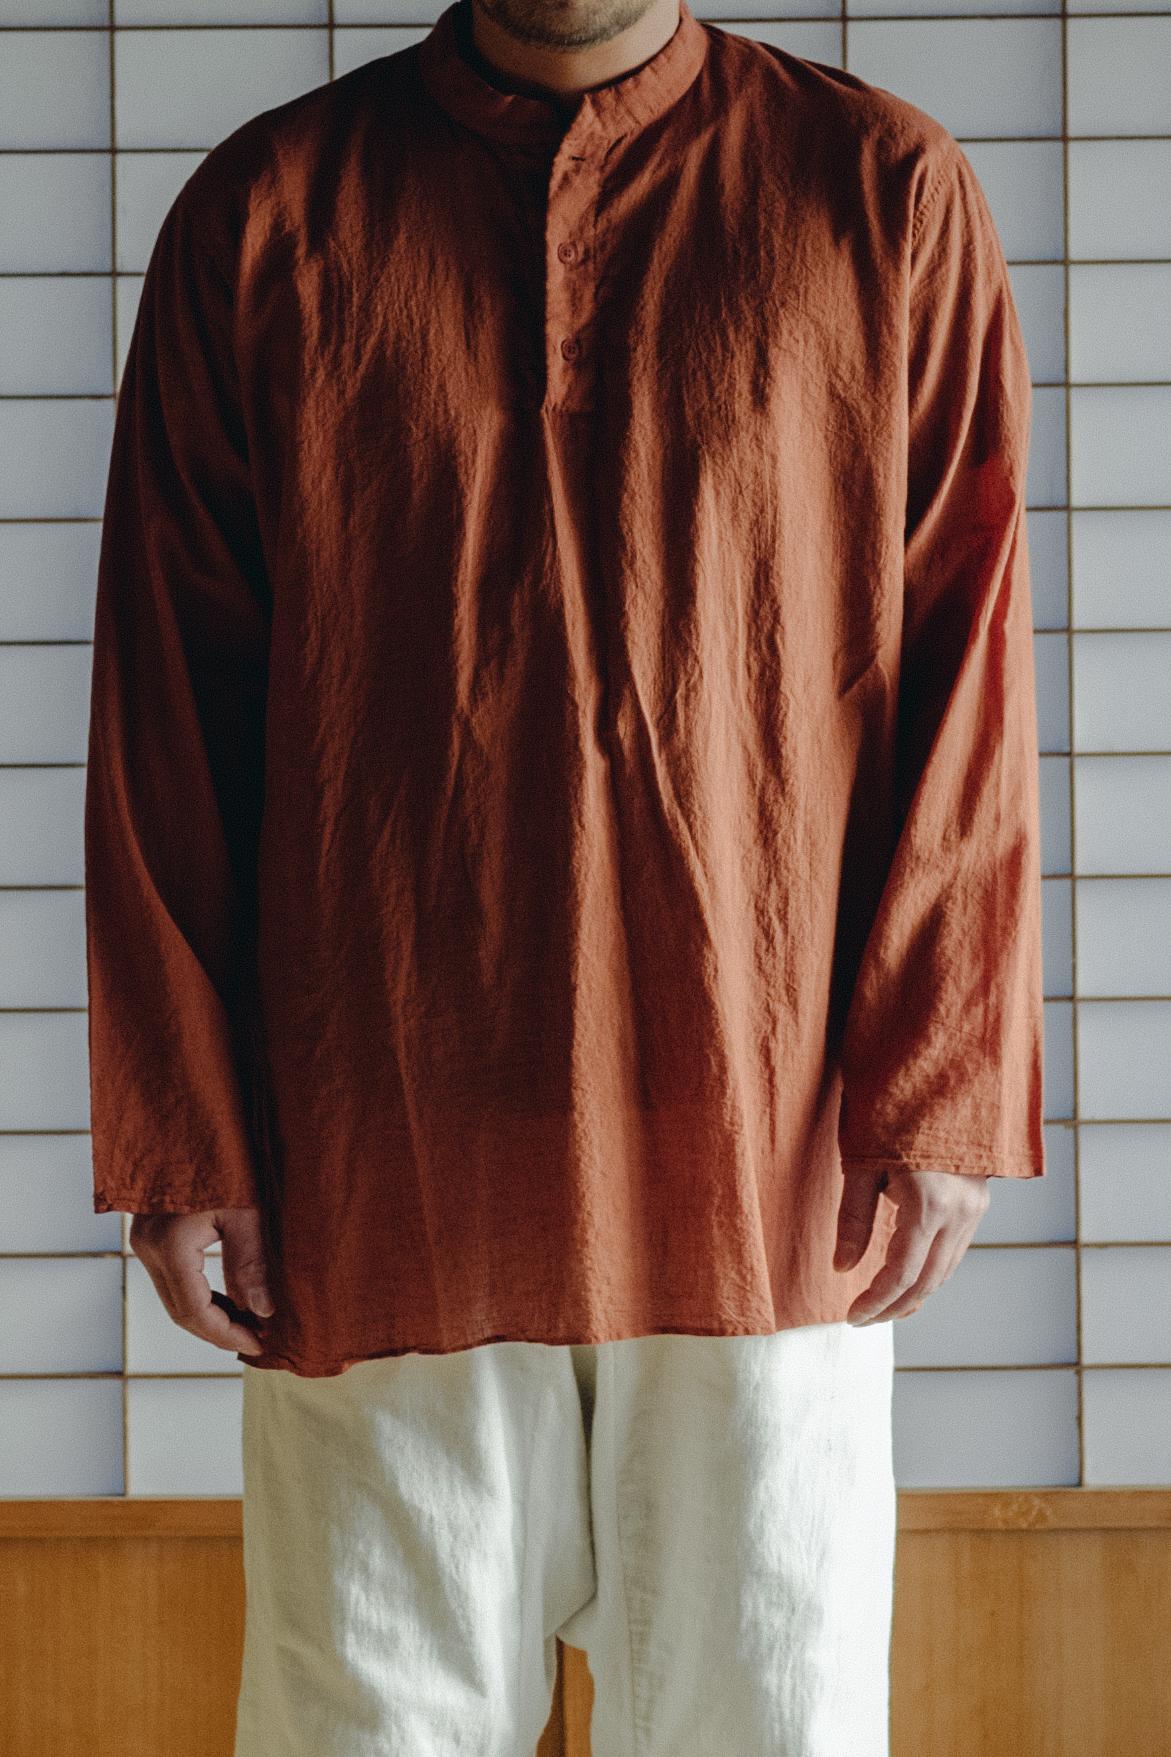 YAECA khadi ユニセックス |クルタシャツ cinnamon